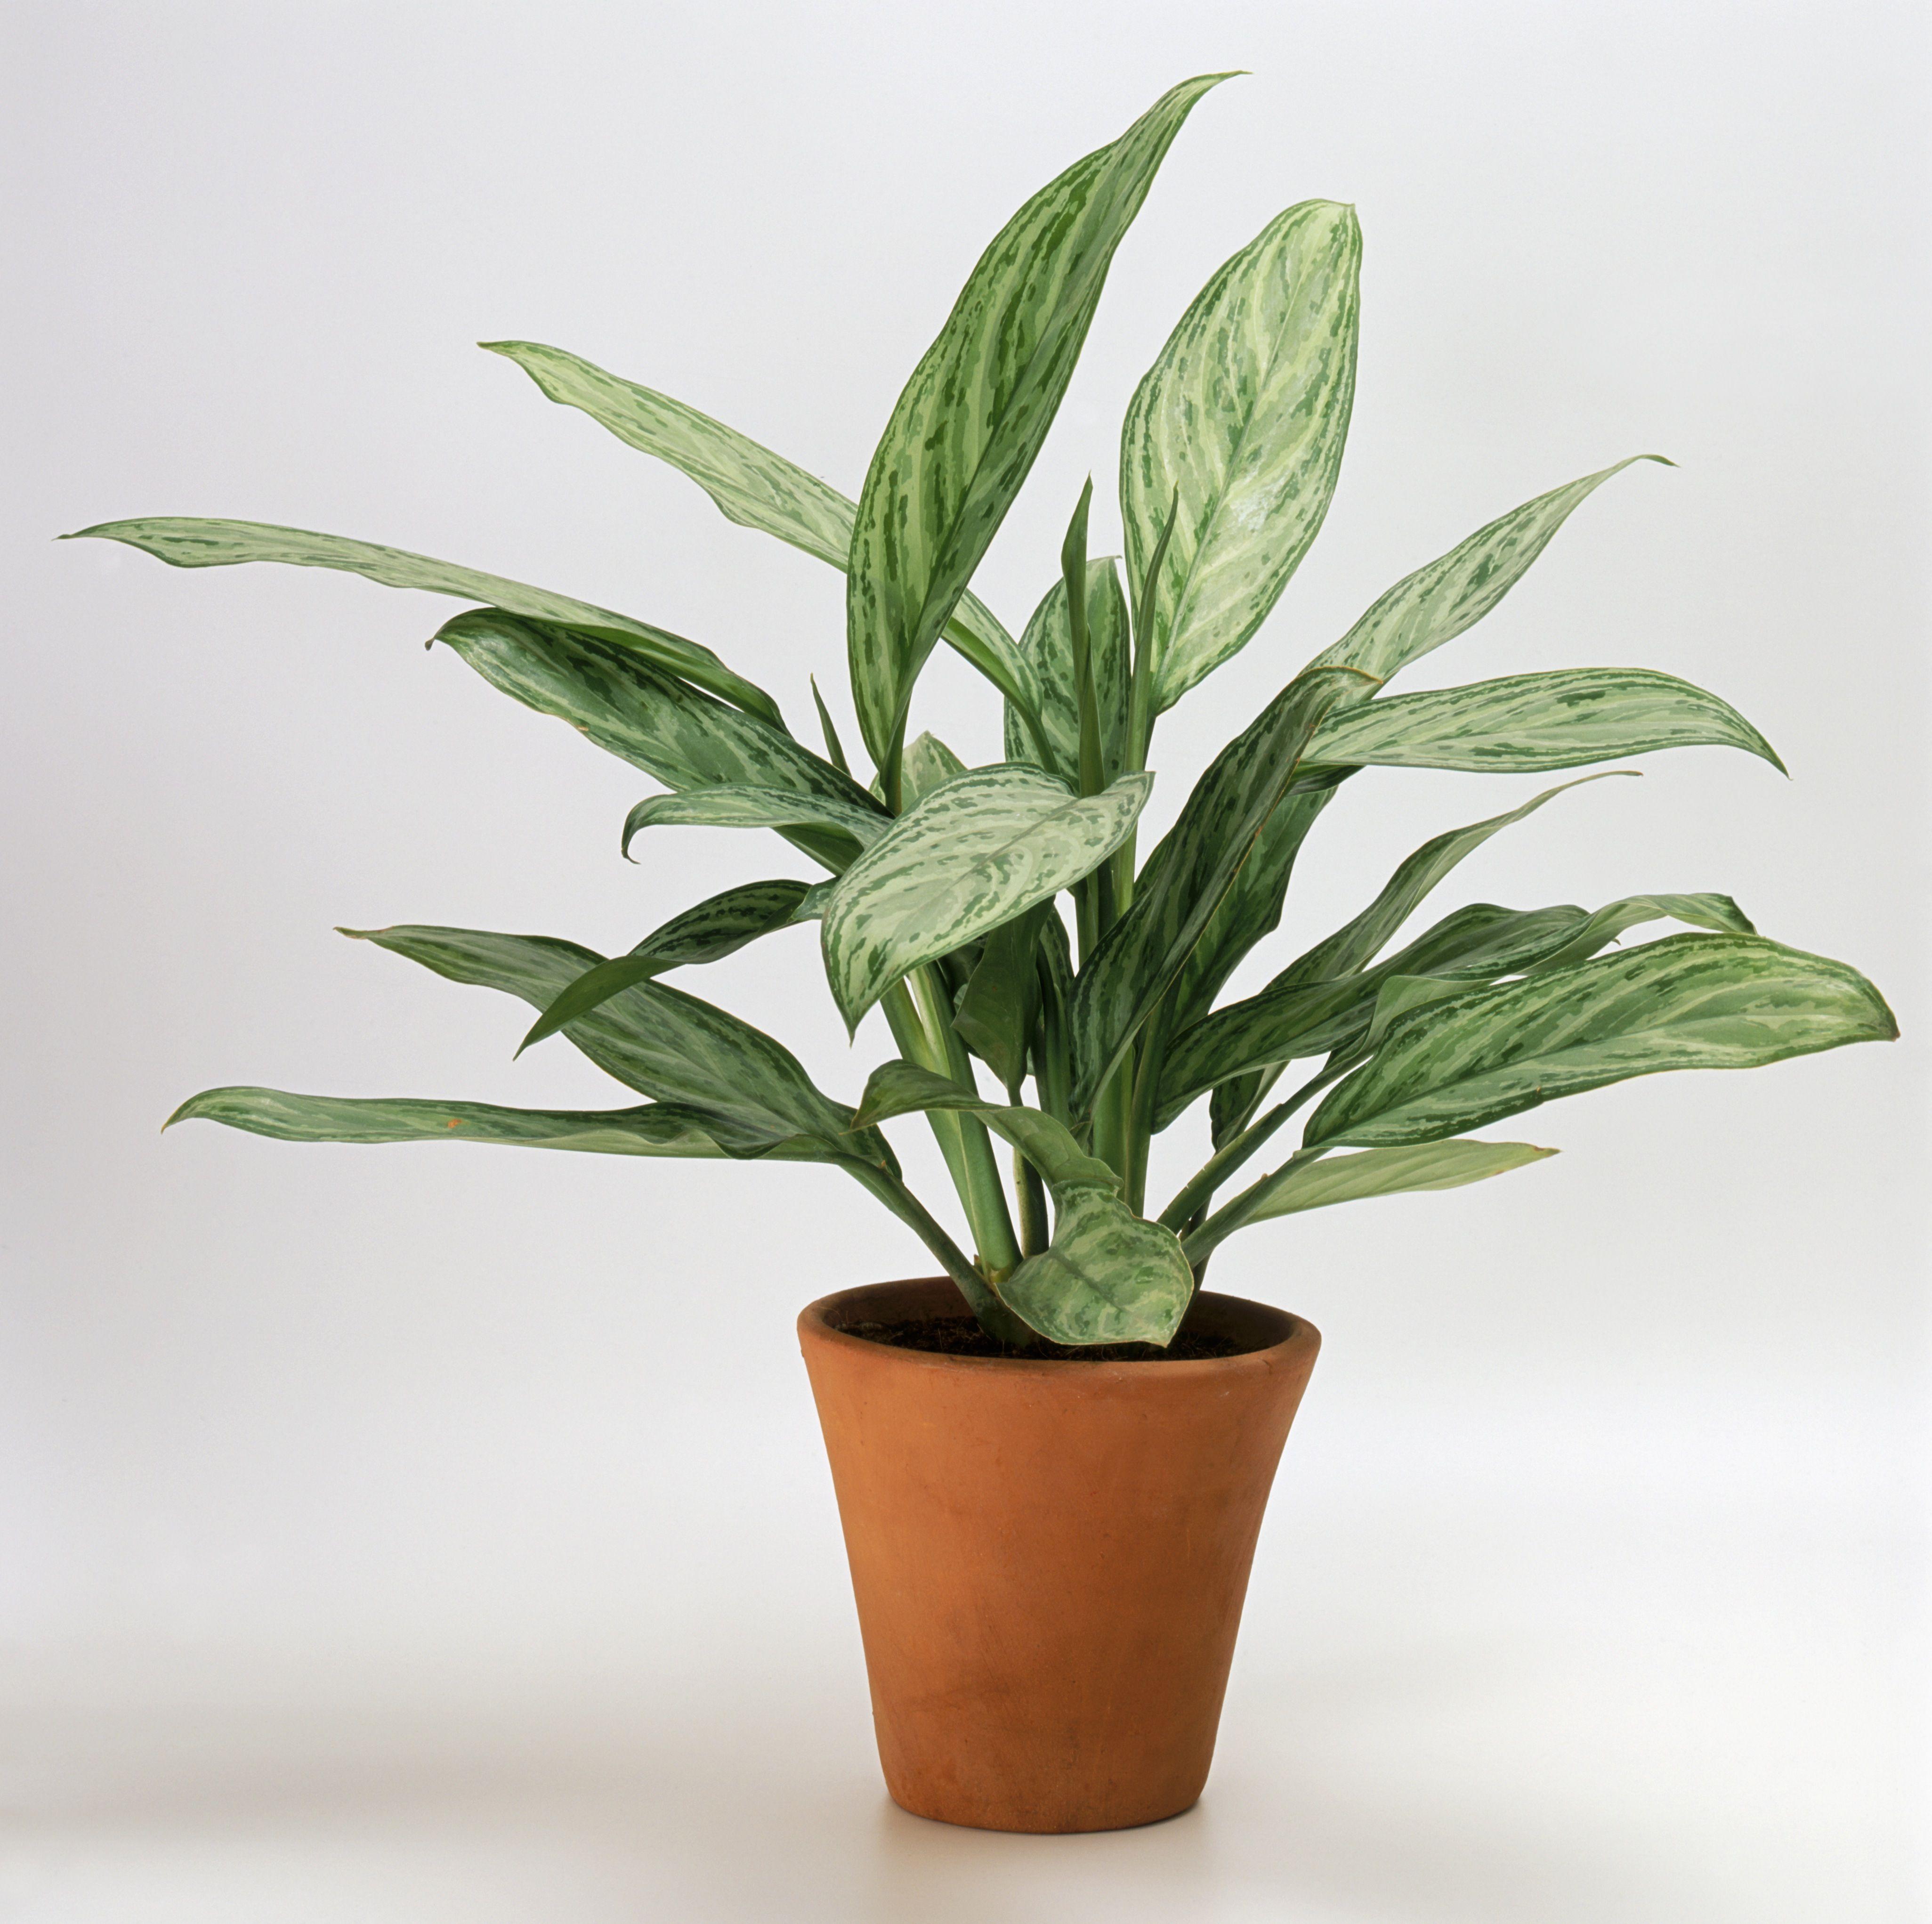 Aglaonema 'Lilian' (Chinese evergreen) in terracotta pot